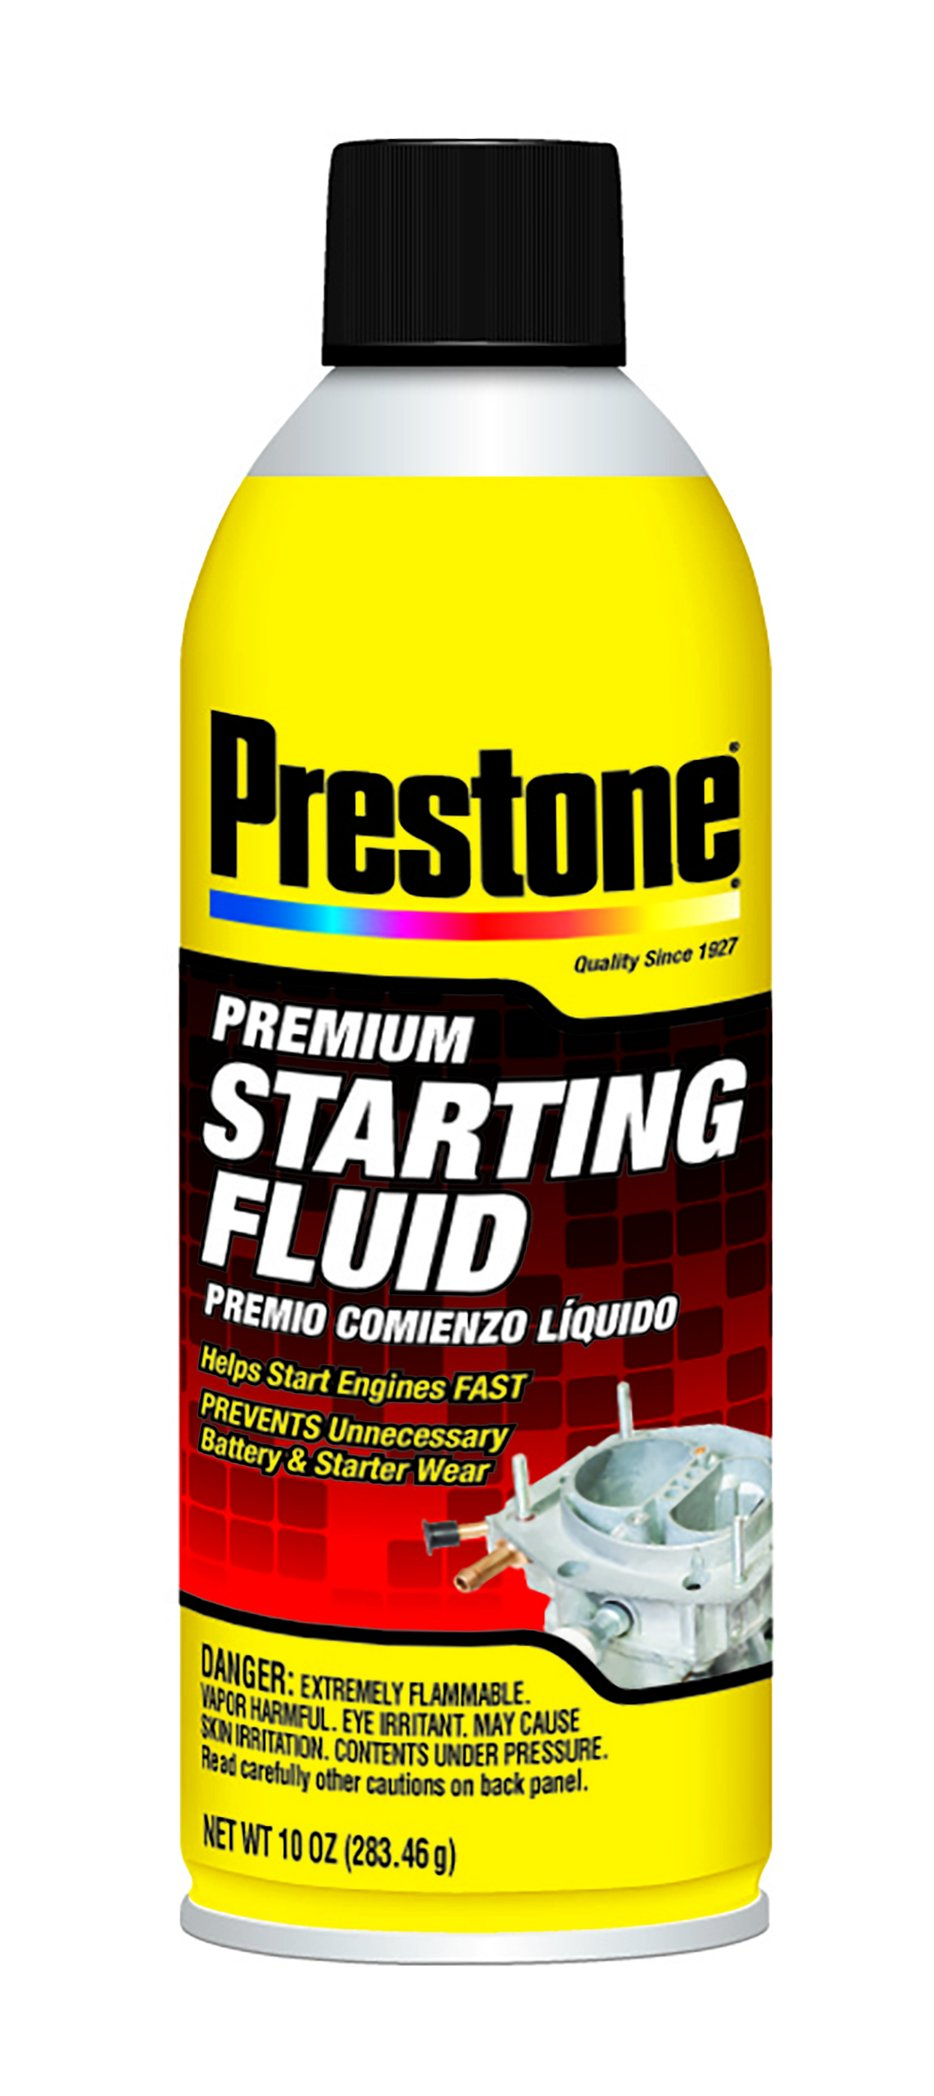 Prestone AS237-6PK Premium Starting Fluid - 10 oz., (Pack of 6) by Prestone